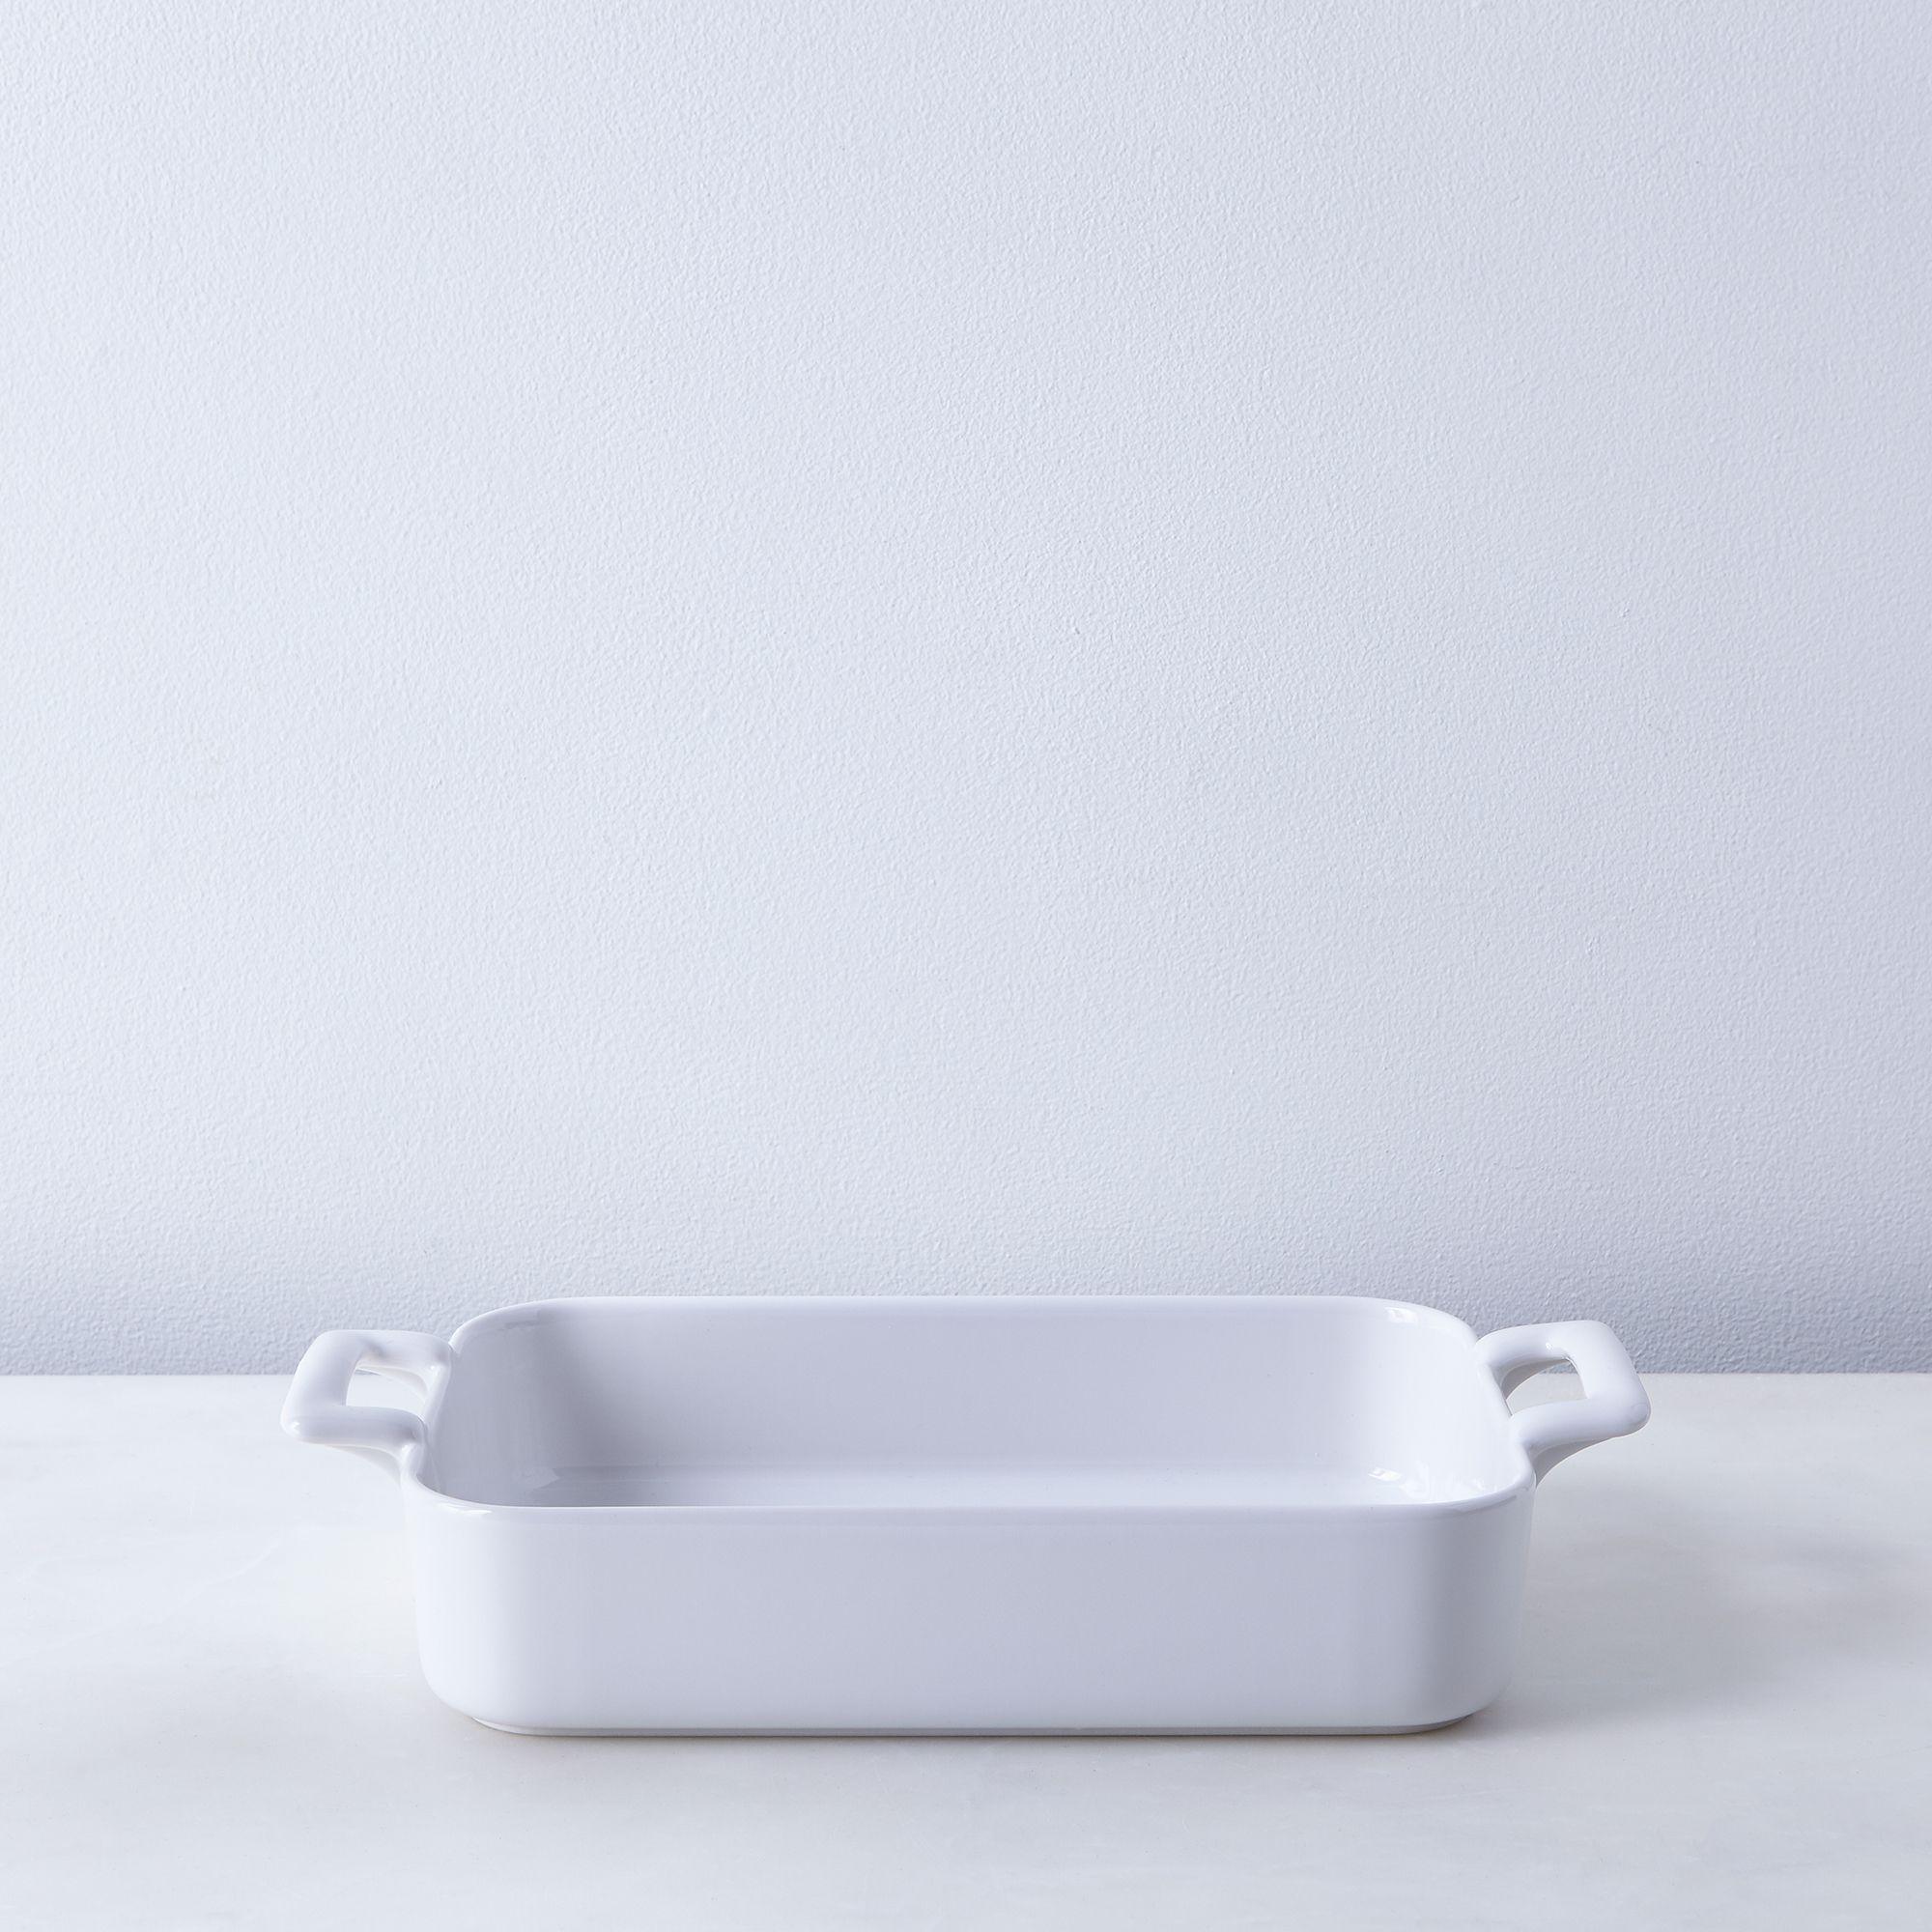 Porcelain Rectangular Roasting Dishes 10.25 X 7.25, White